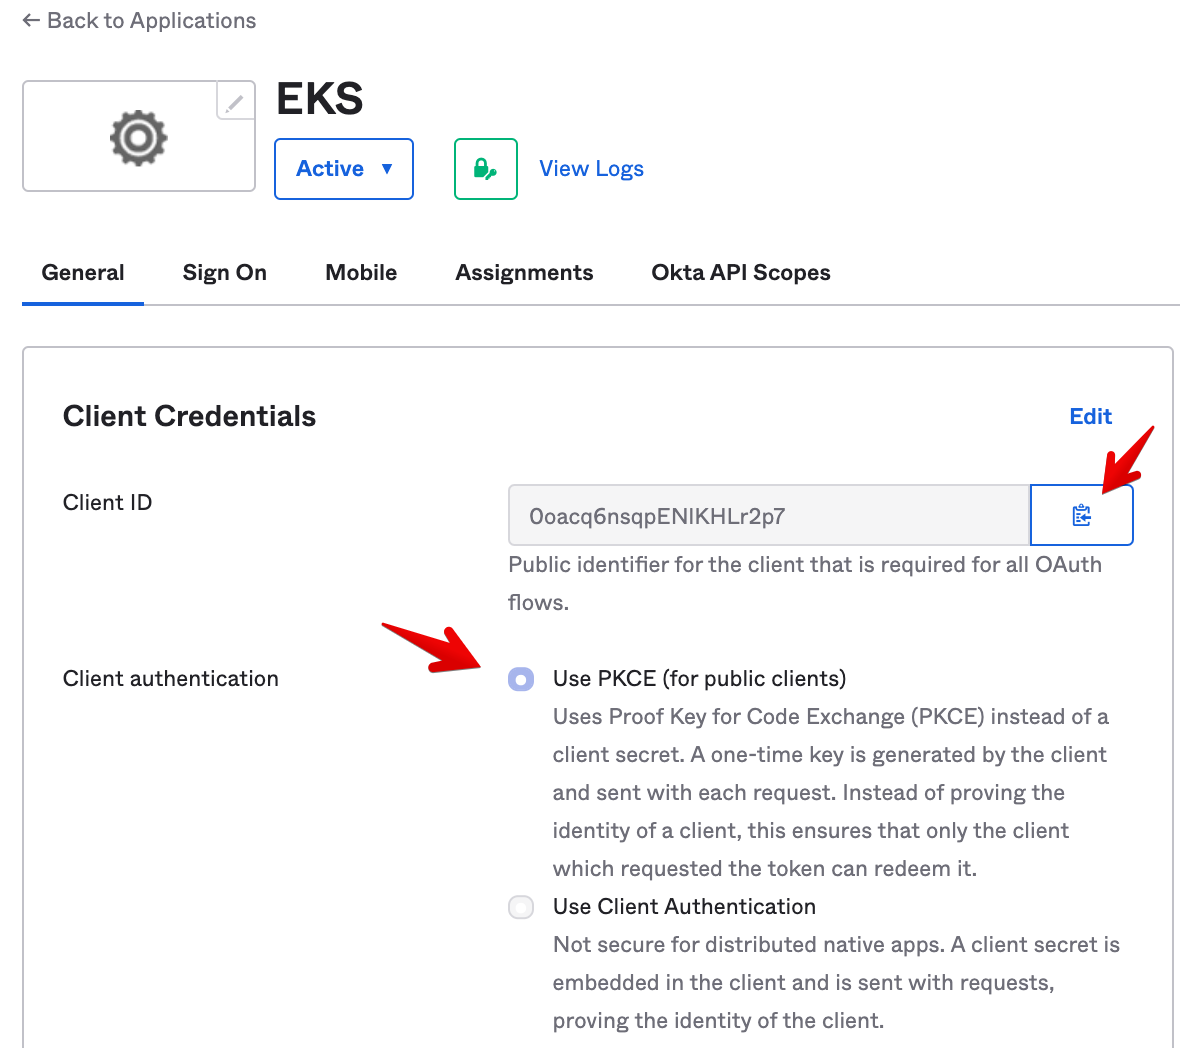 Okta Admin Console - App Configuration - General Tab